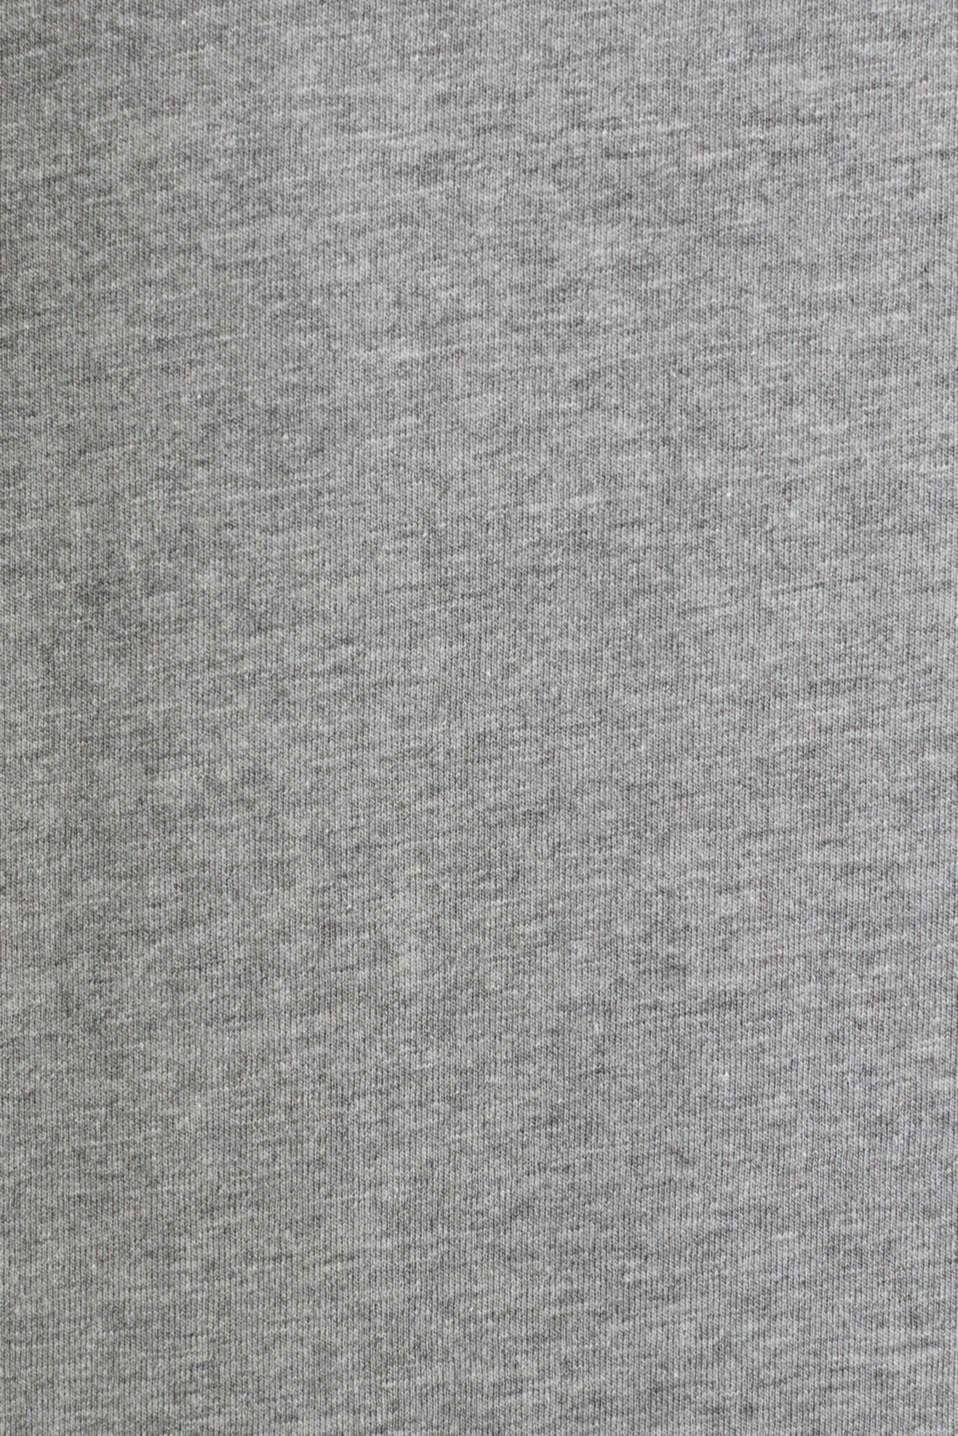 Jersey sleeveless top with a logo print, MEDIUM GREY 5, detail image number 4